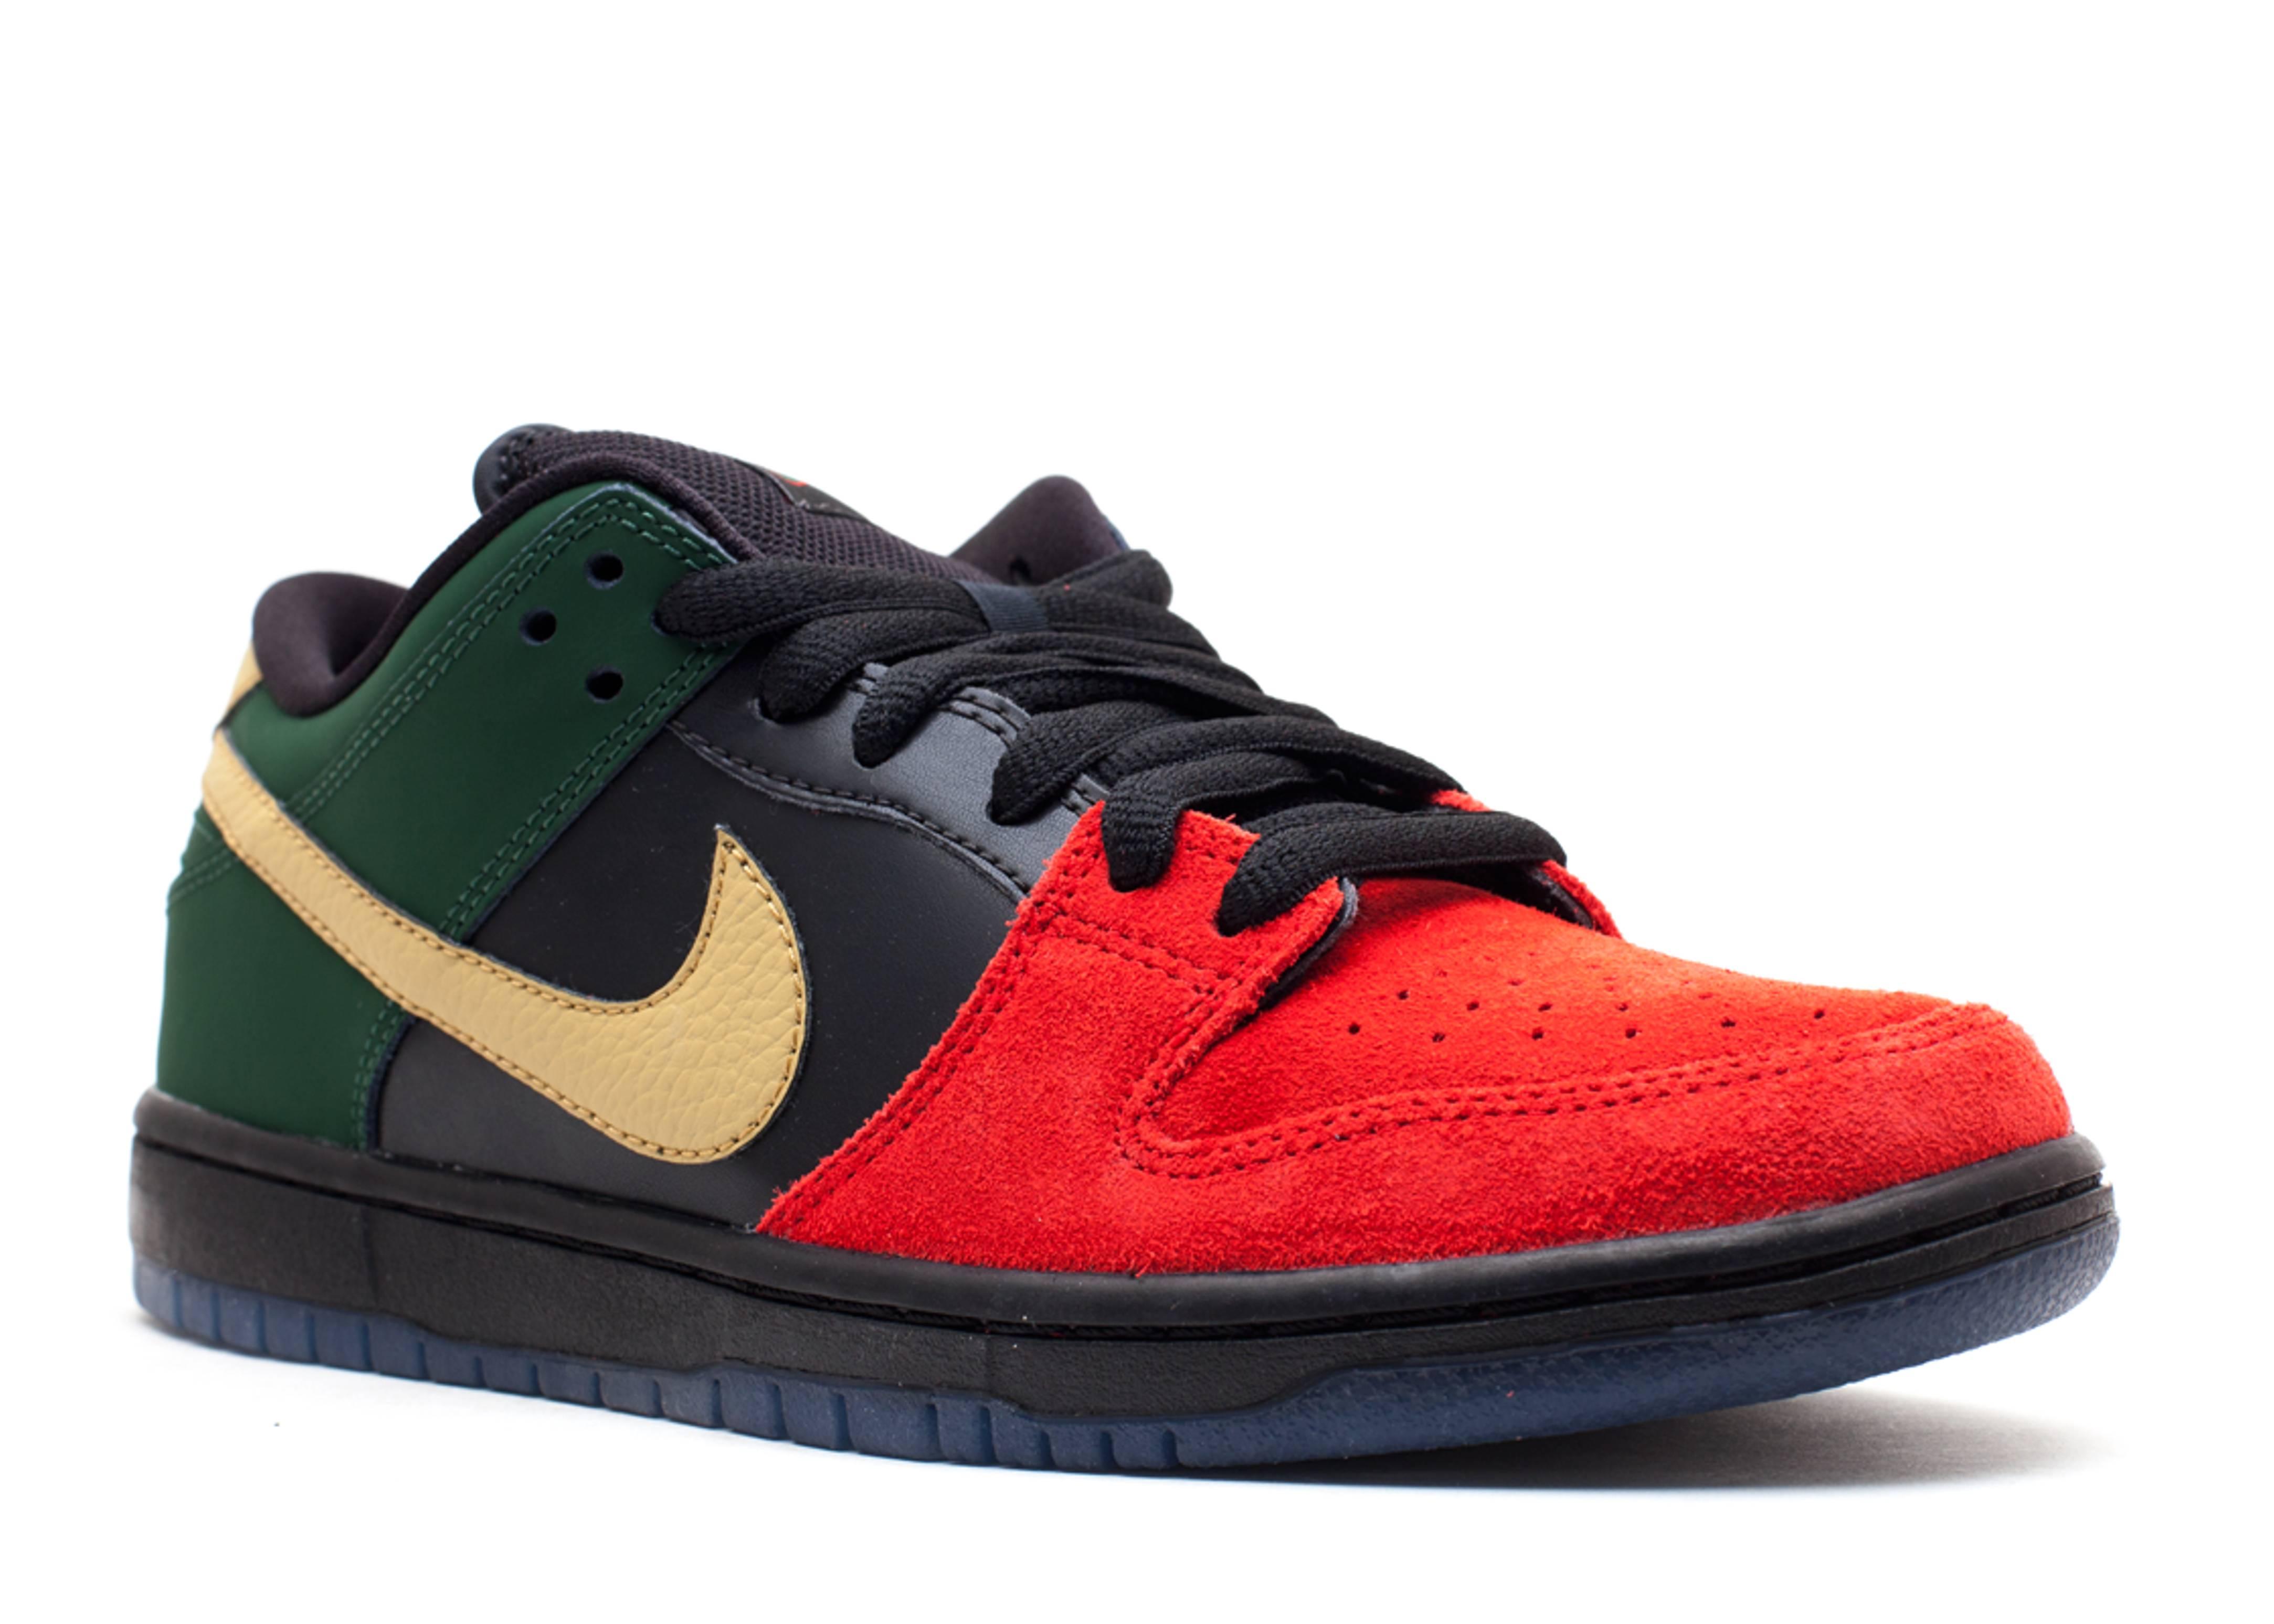 buy online 49aaf 7c4c4 Green Nike Dunk Sb Nike Hyperdunk V Jordan Fly 23 Comparison